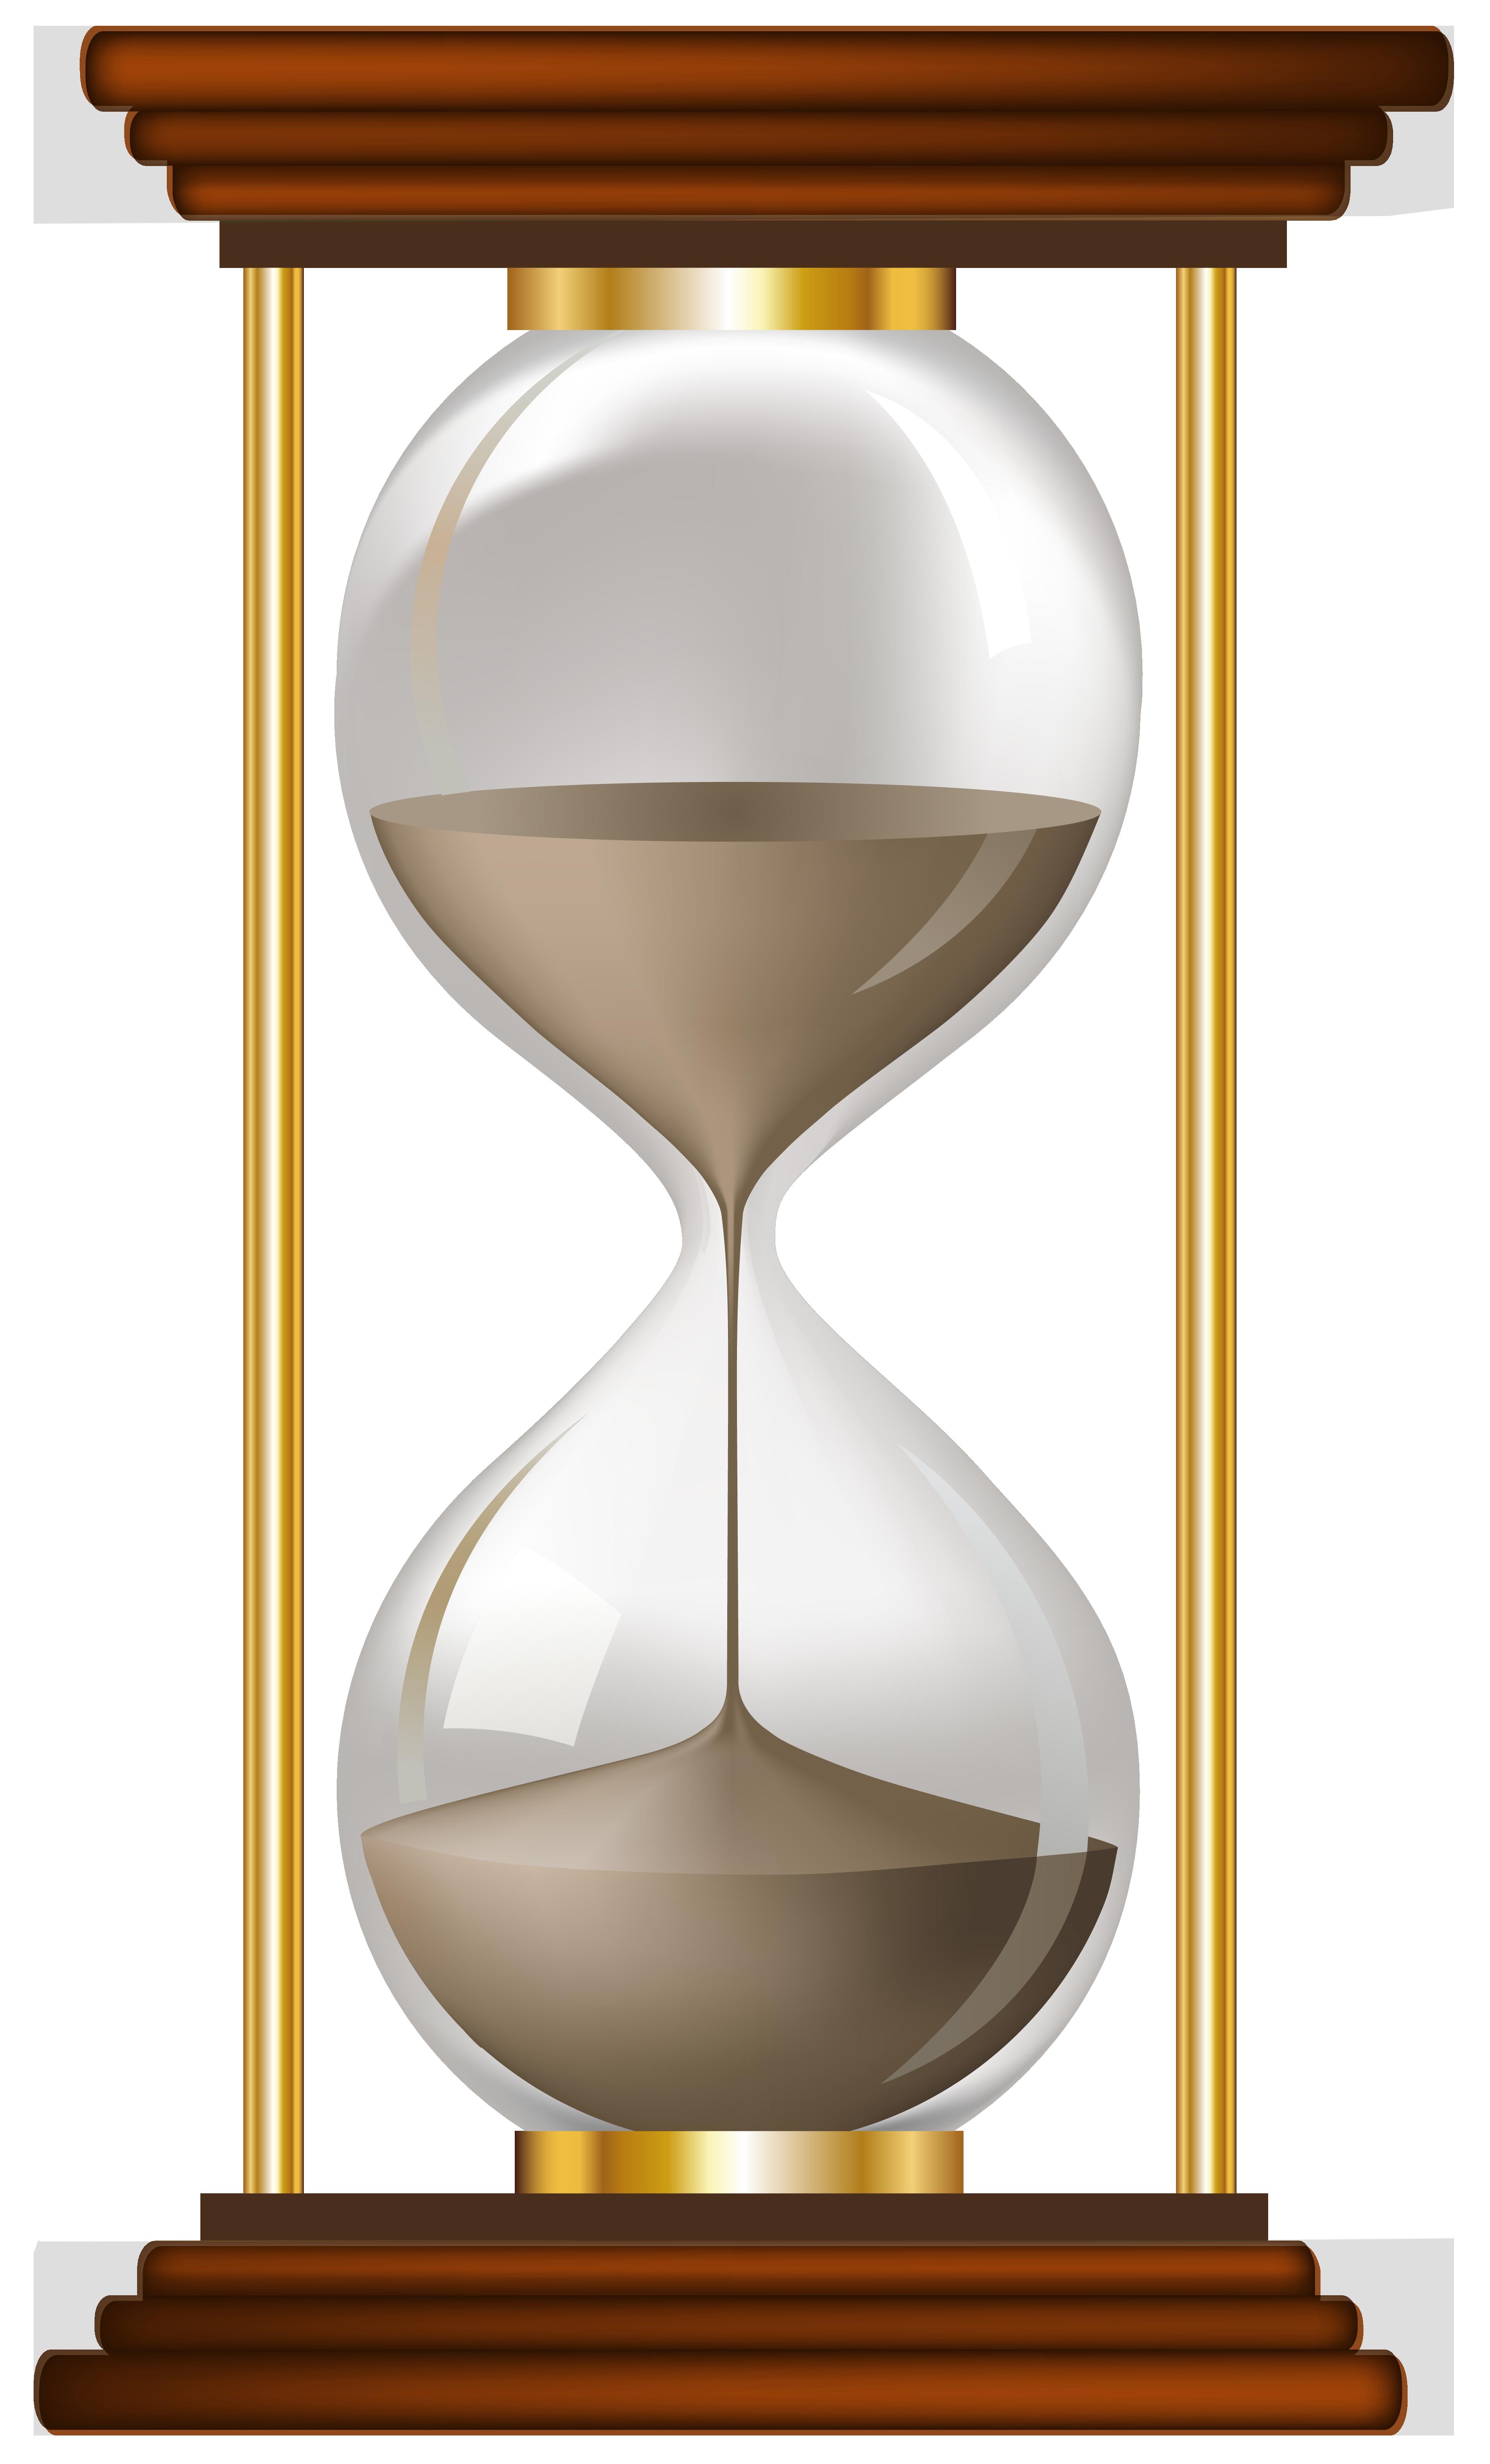 hourglass clipart empty